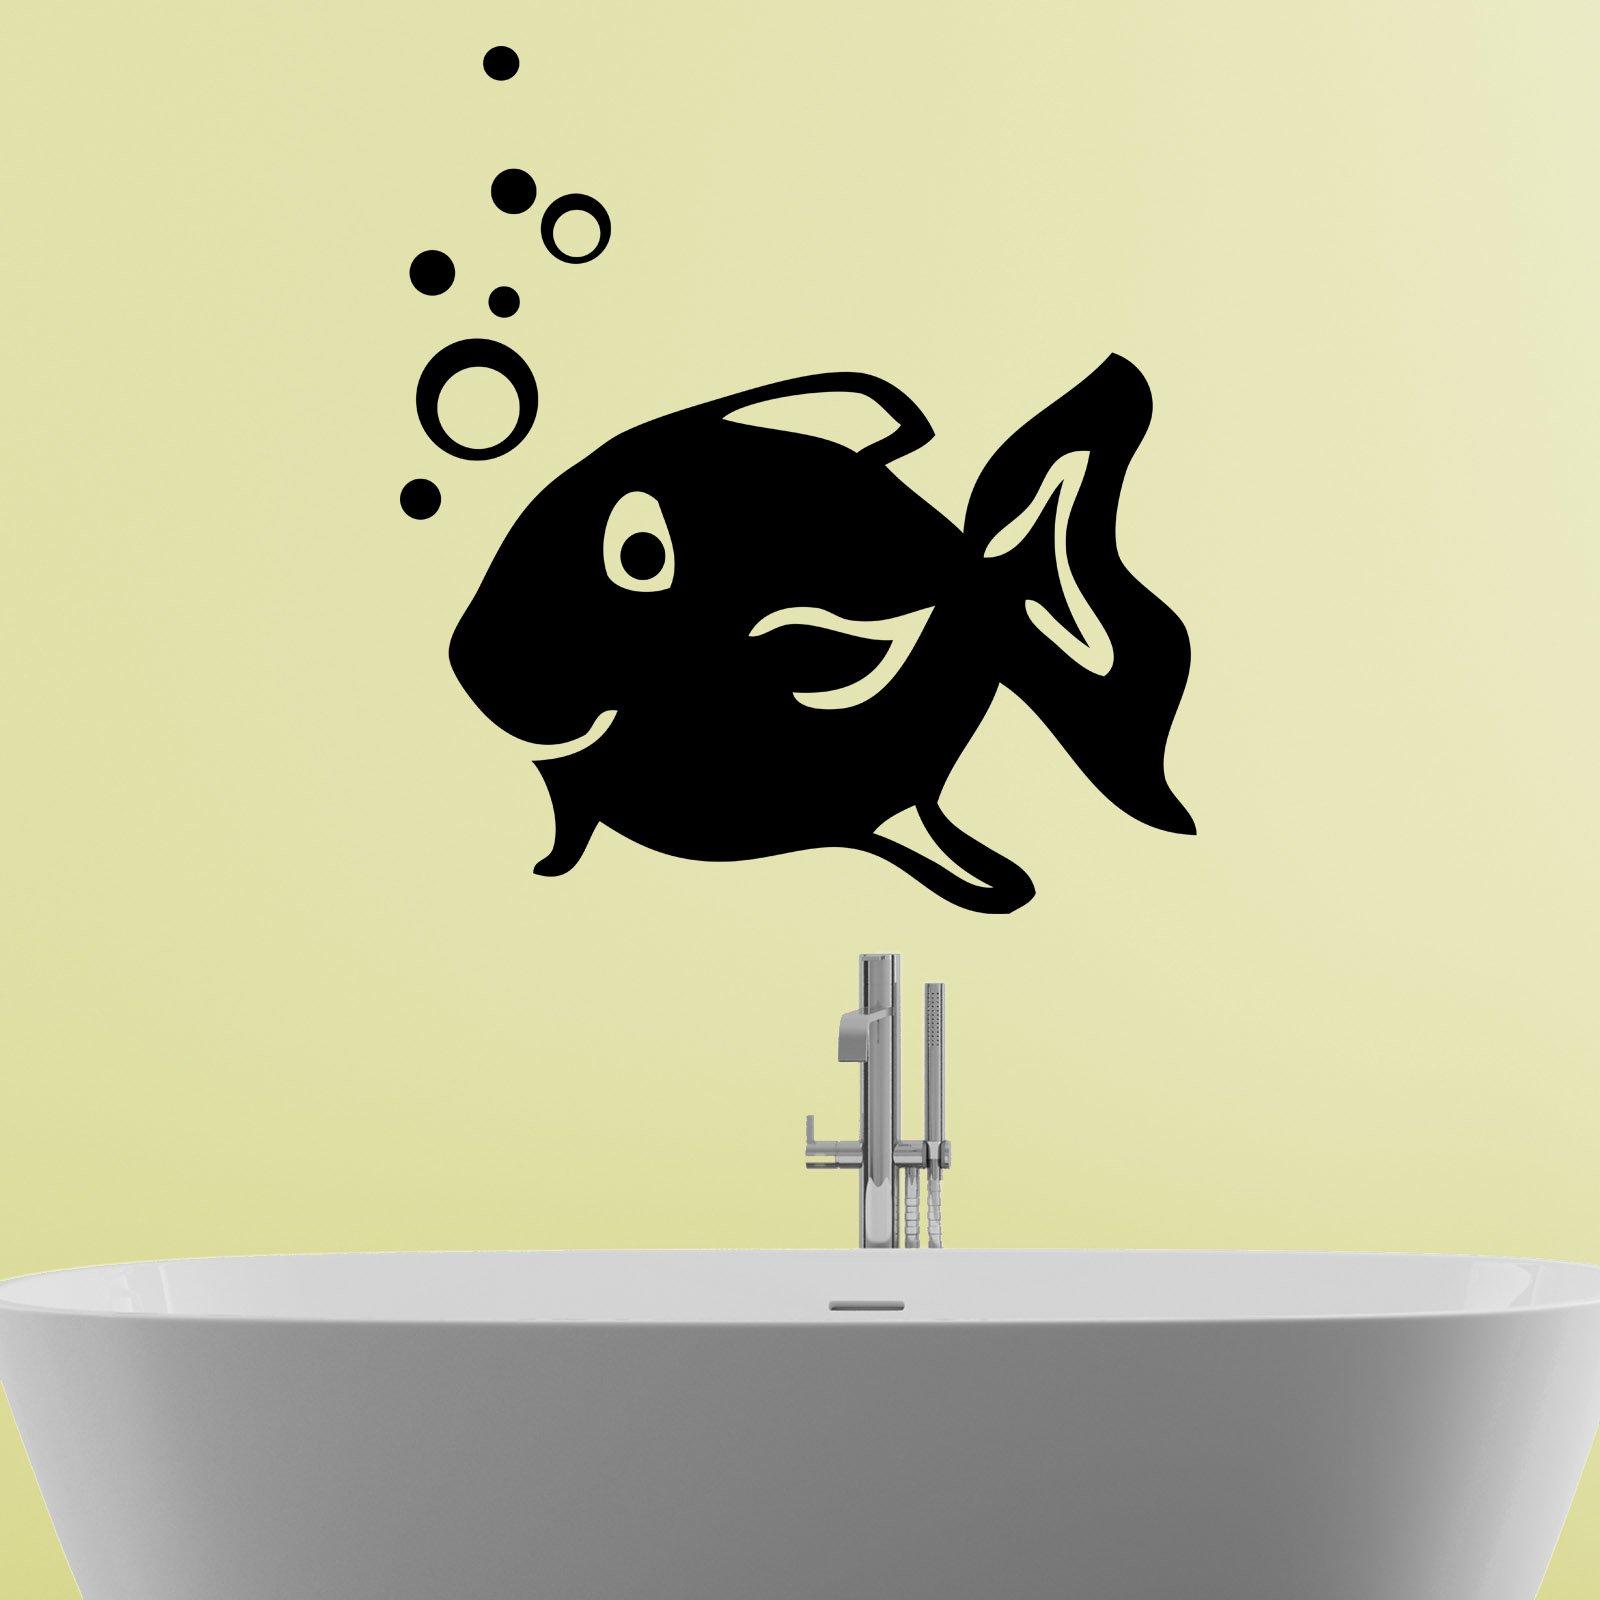 Happy Fish Blowing Bubbles Bathroom Wall Sticker - World of Wall ...